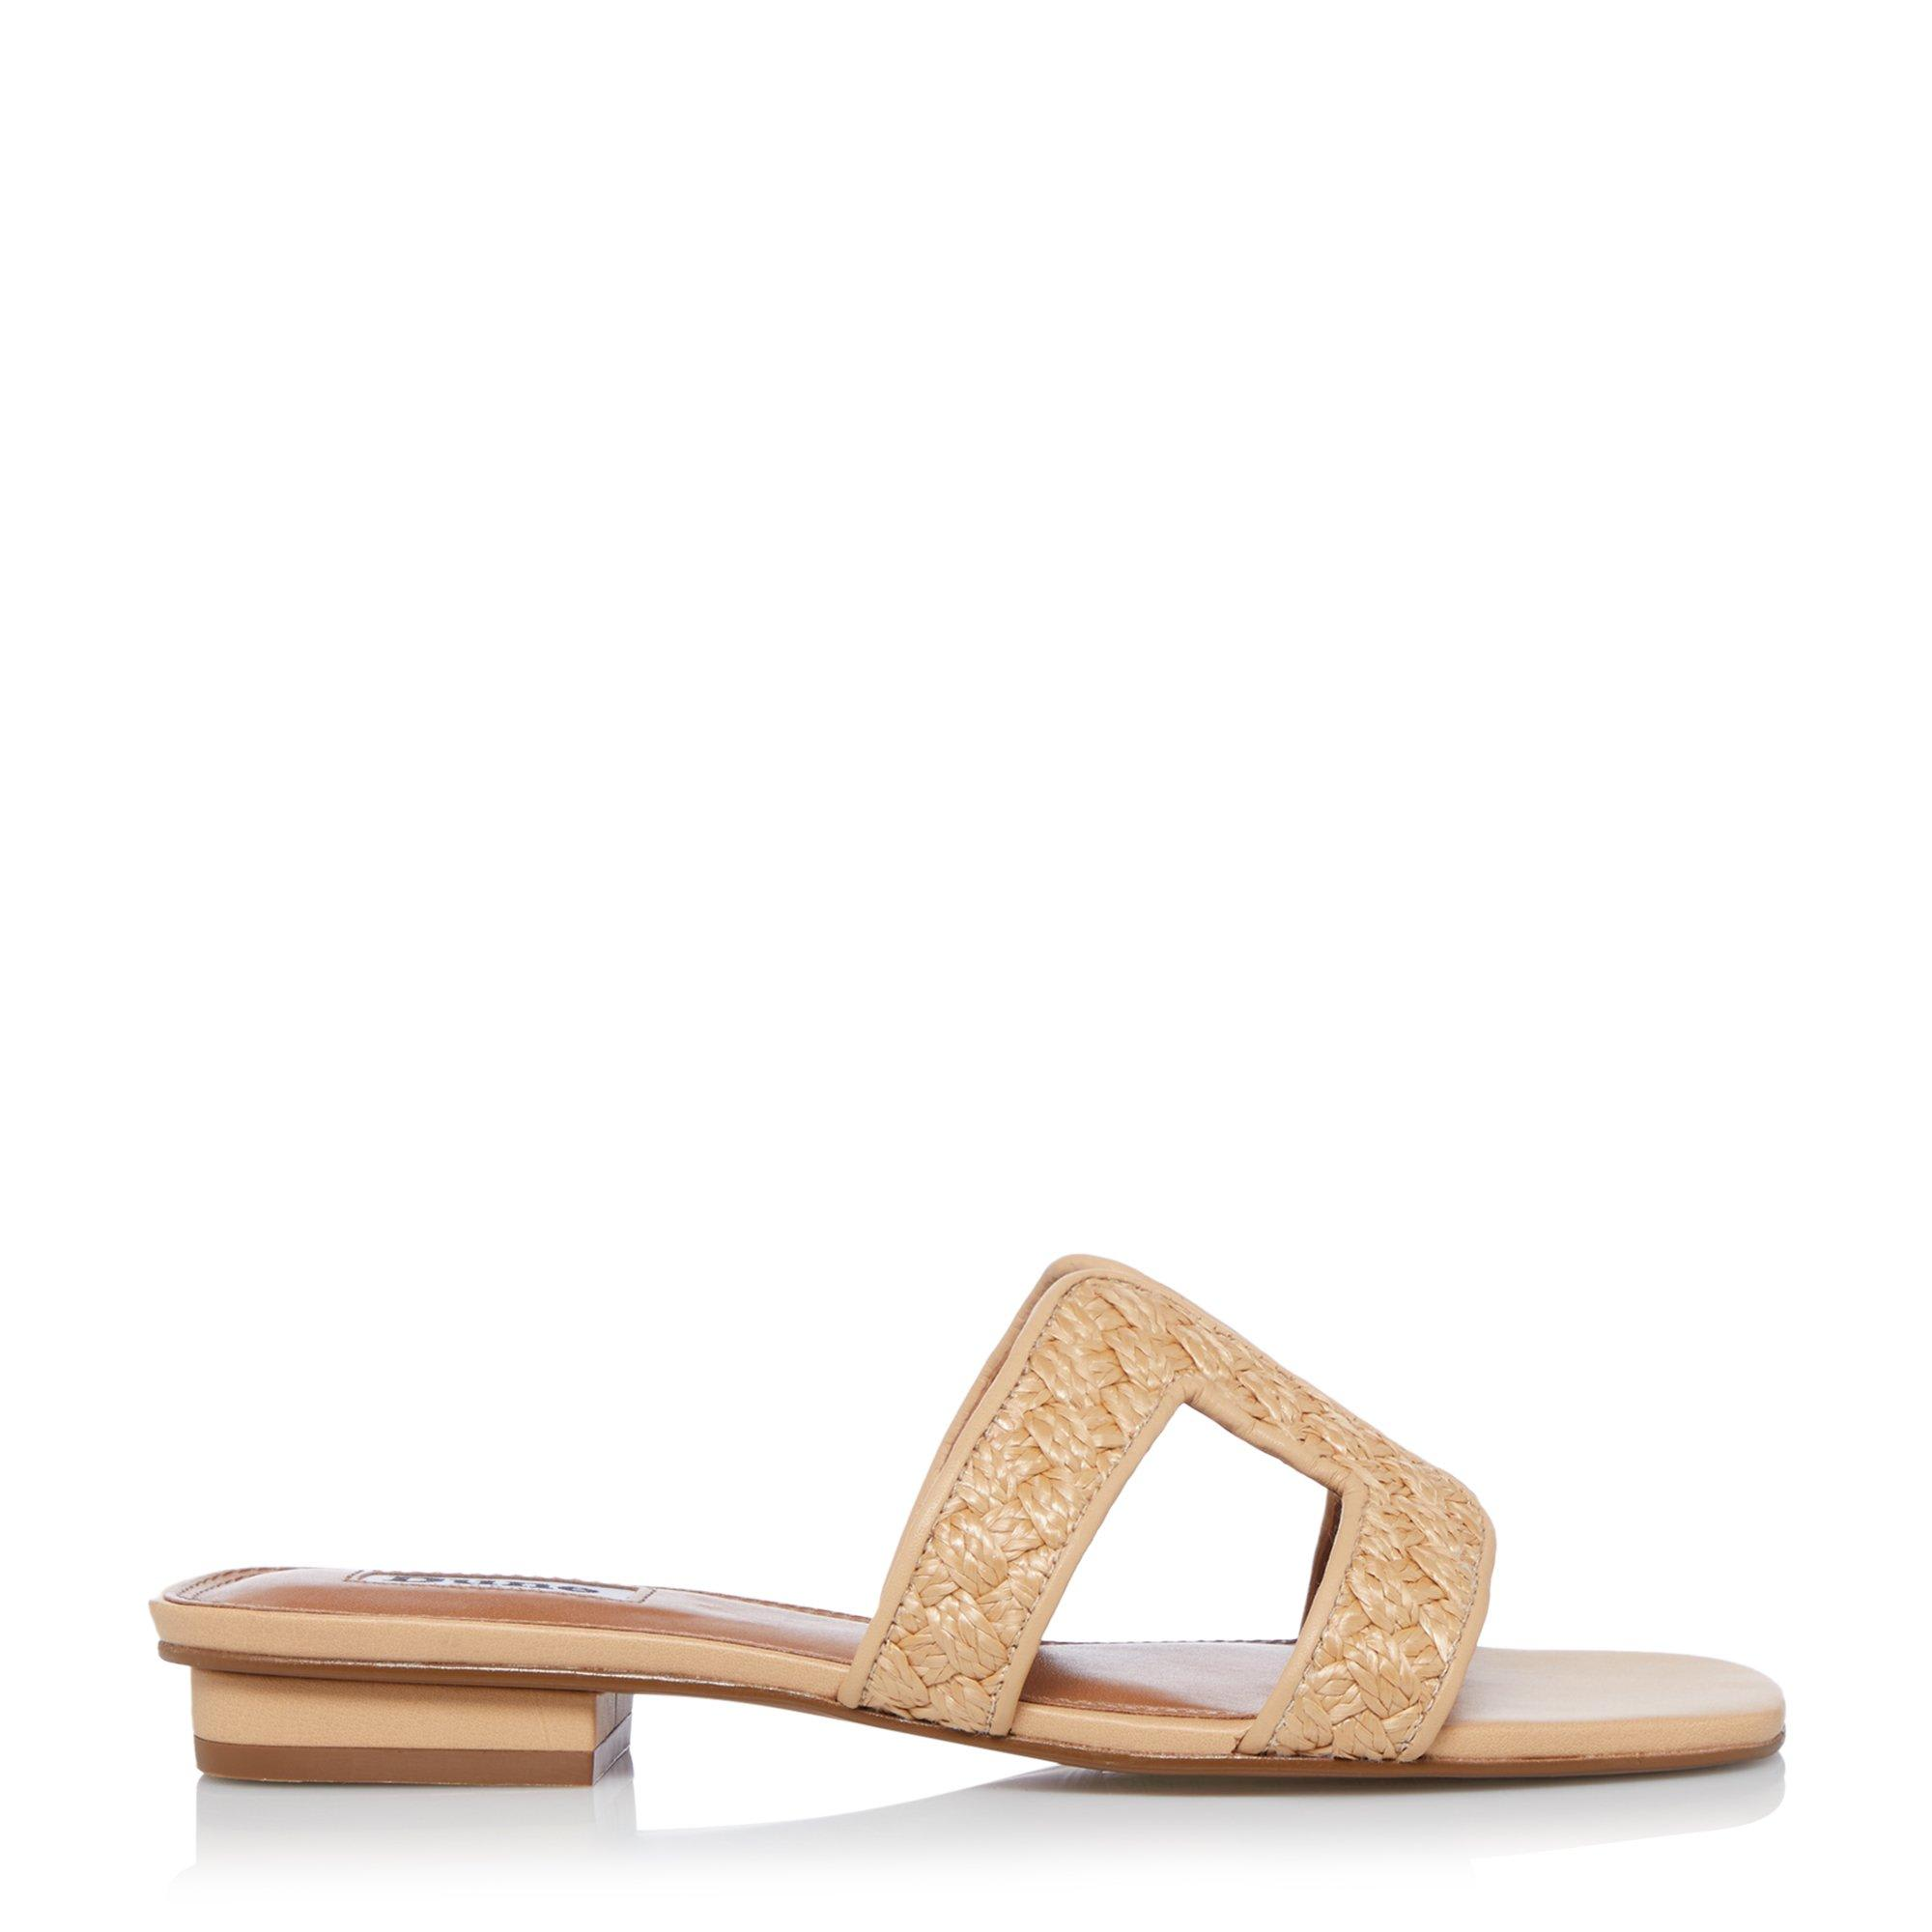 thumbnail 6 - Dune Ladies LOUPE Smart Slider Sandals